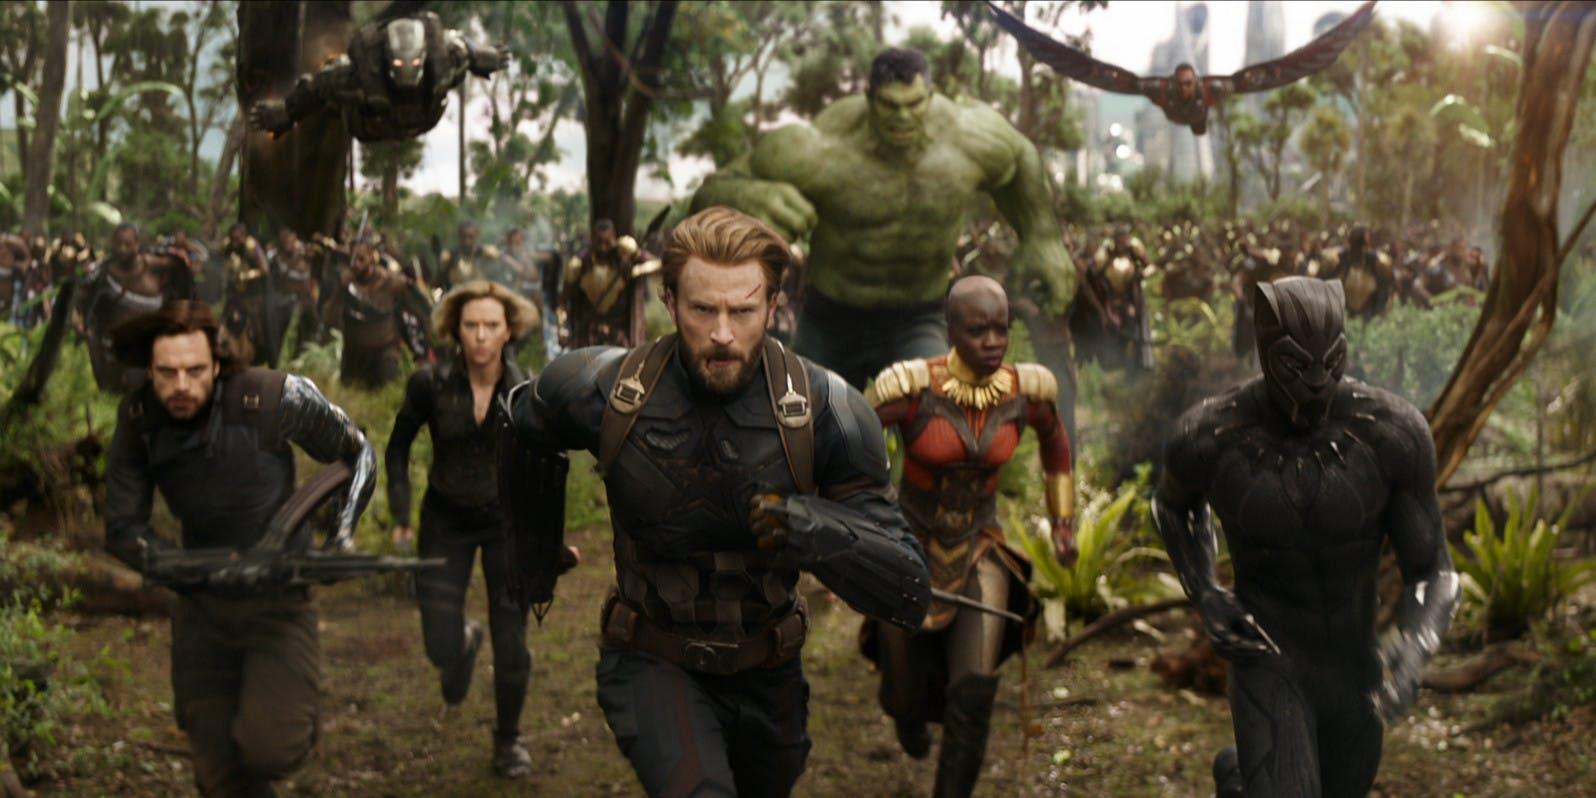 The Avengers: Infinity War